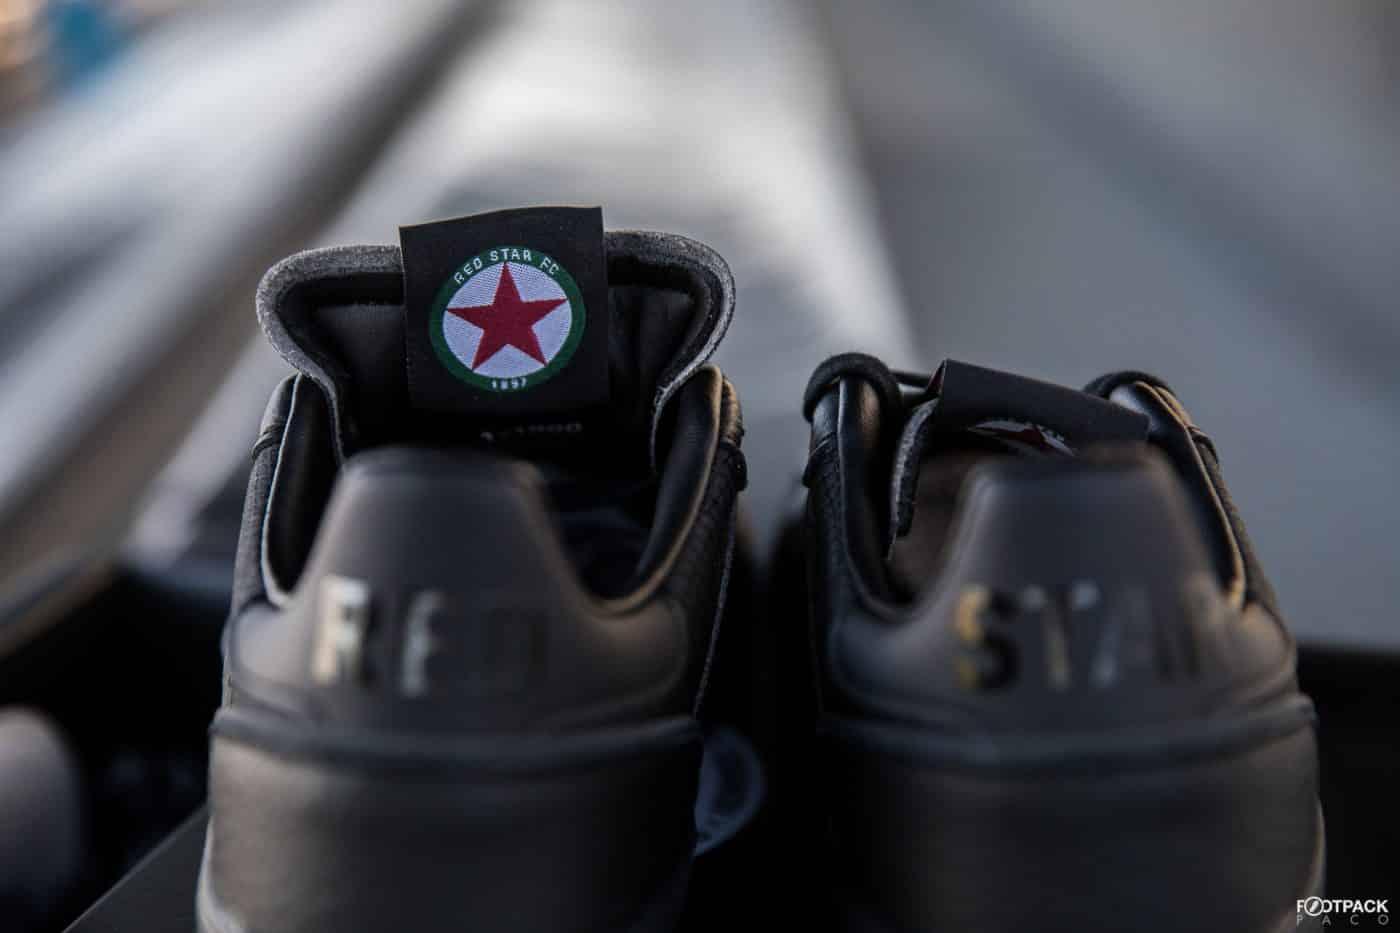 adidas-sobakov-red-star-footpack-12